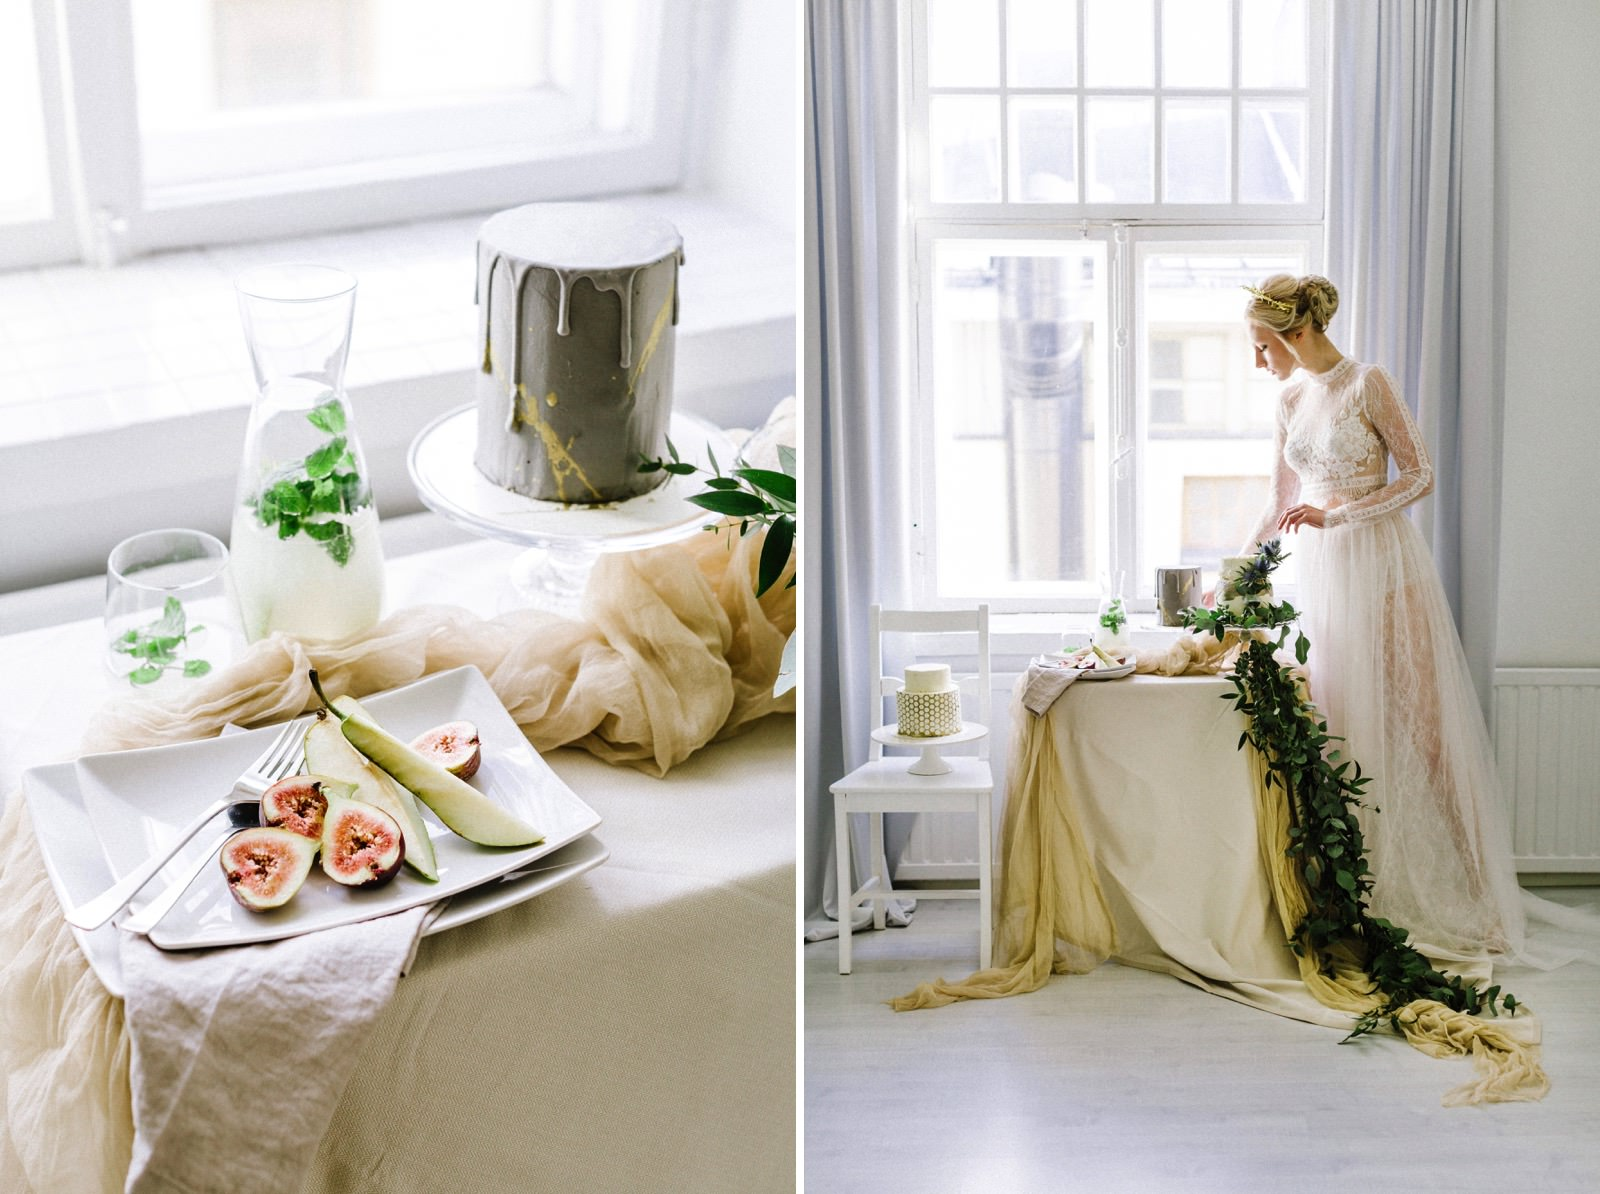 lifestyle photographer Helsinki